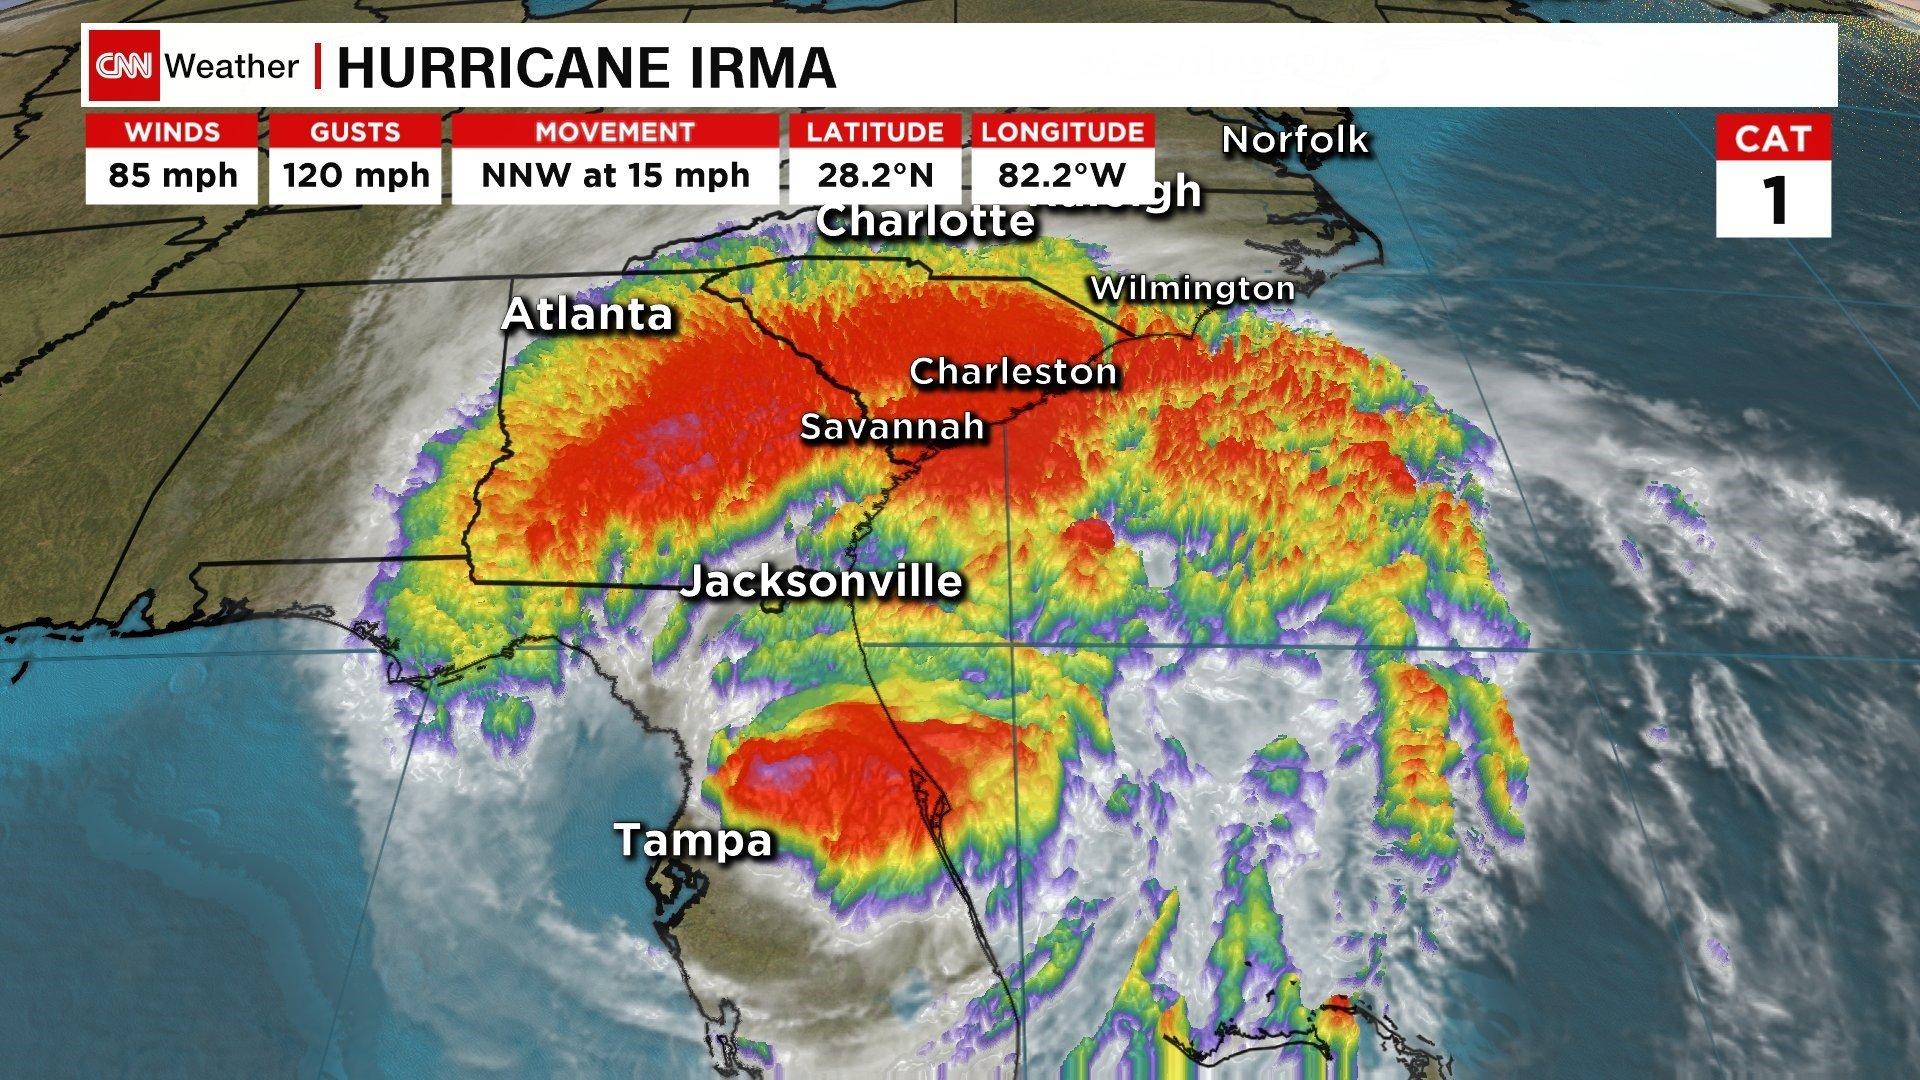 Satellite Images Show Hurricane Irma's Caribbean Destruction